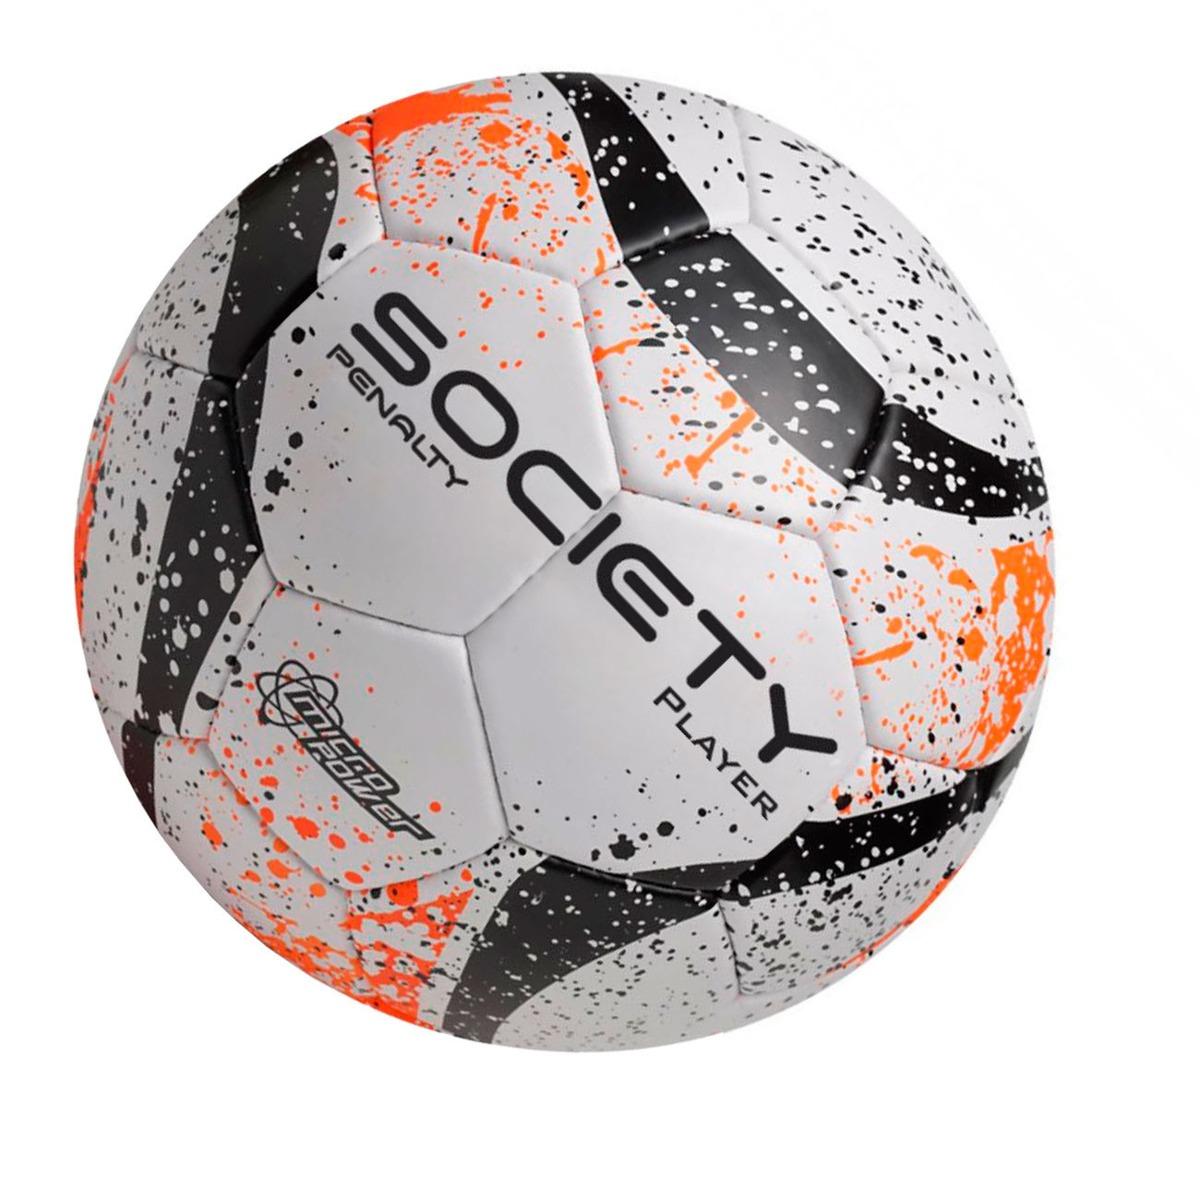 9006293d1a14e bola de futebol society player ii alaranjada. Carregando zoom.